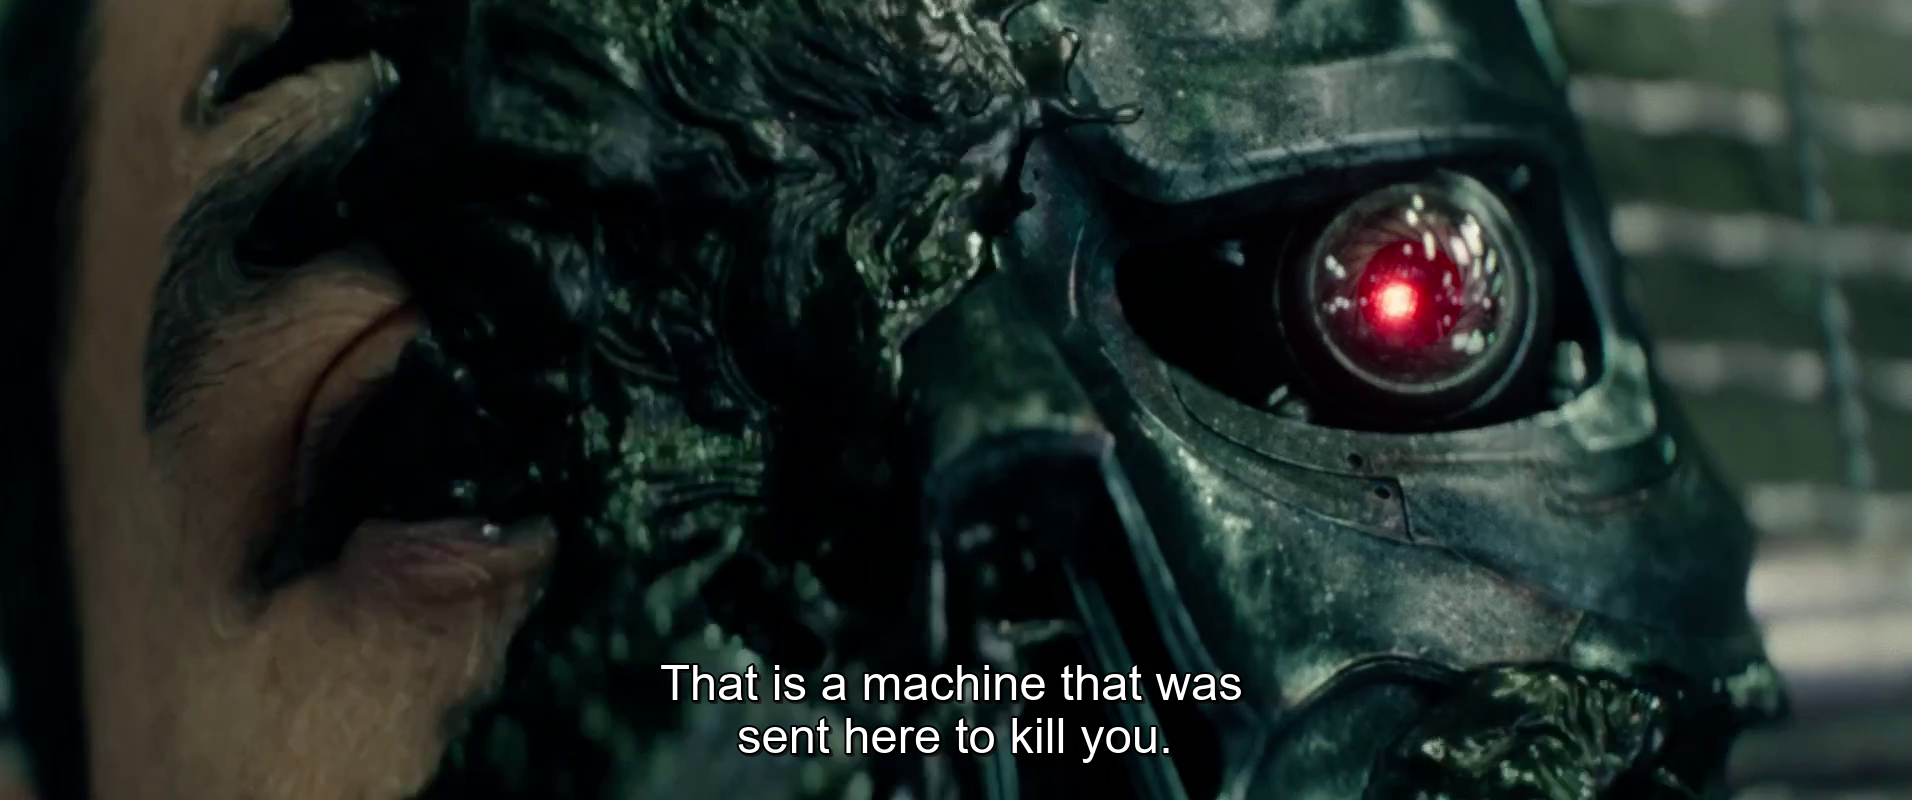 Download Terminator: Dark Fate (2019) WEB-DL Dual Audio {Hindi-English} 1080p [1.8GB] || 720p [900MB] || 480p [400MB]